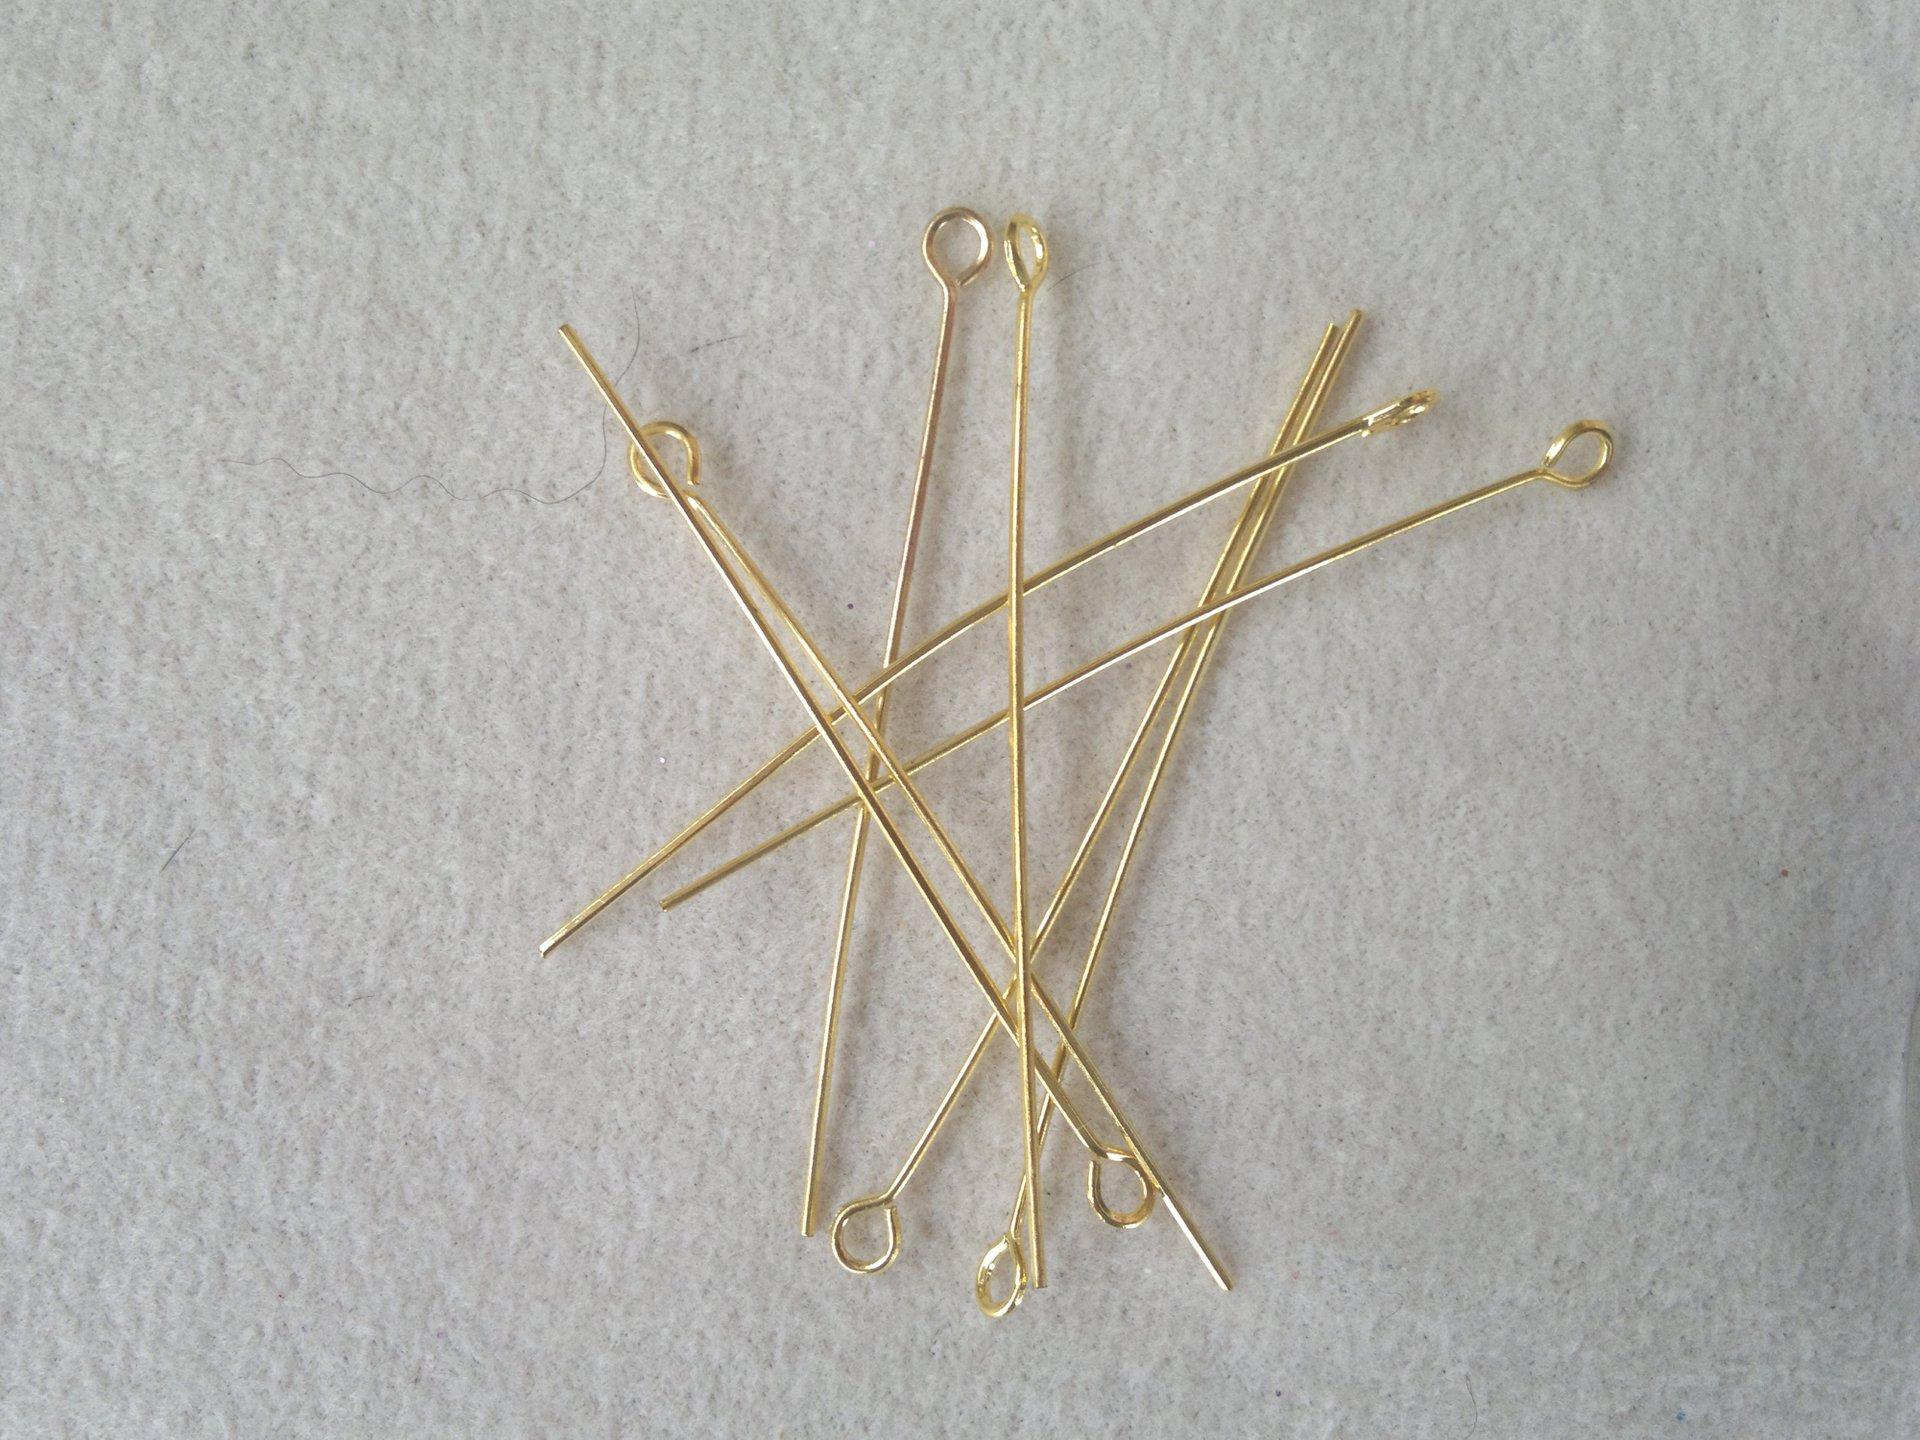 Ketlovací jehly 5 cm, zlaté